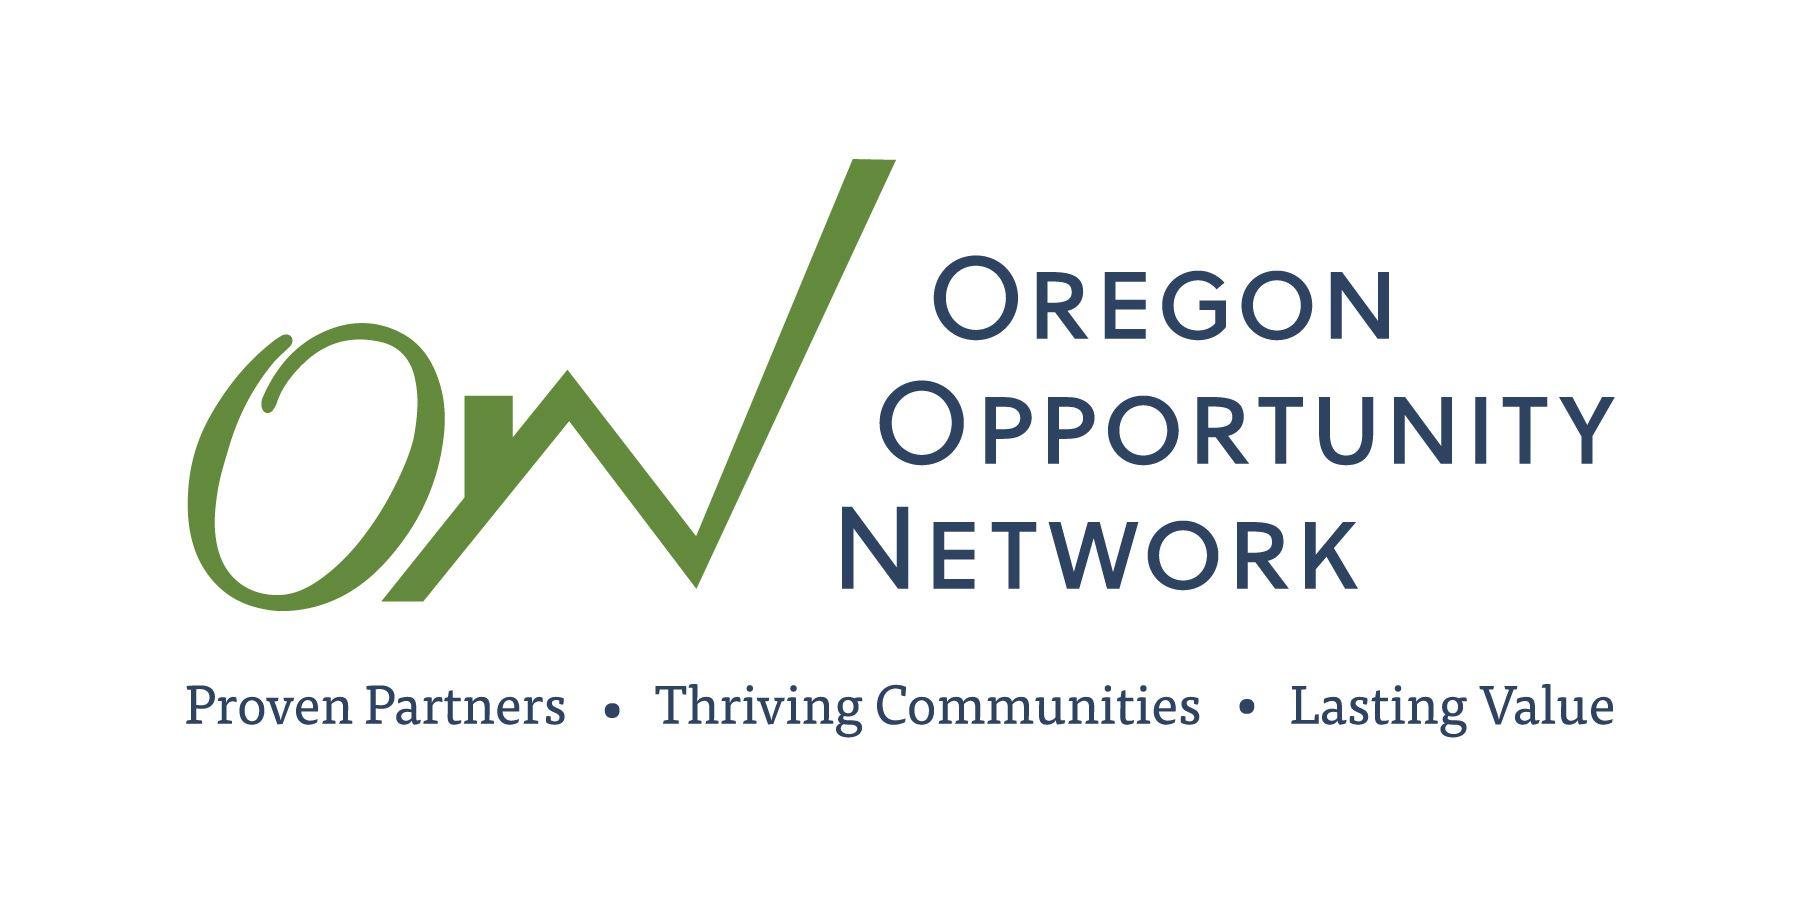 Oregon Opportunity Network